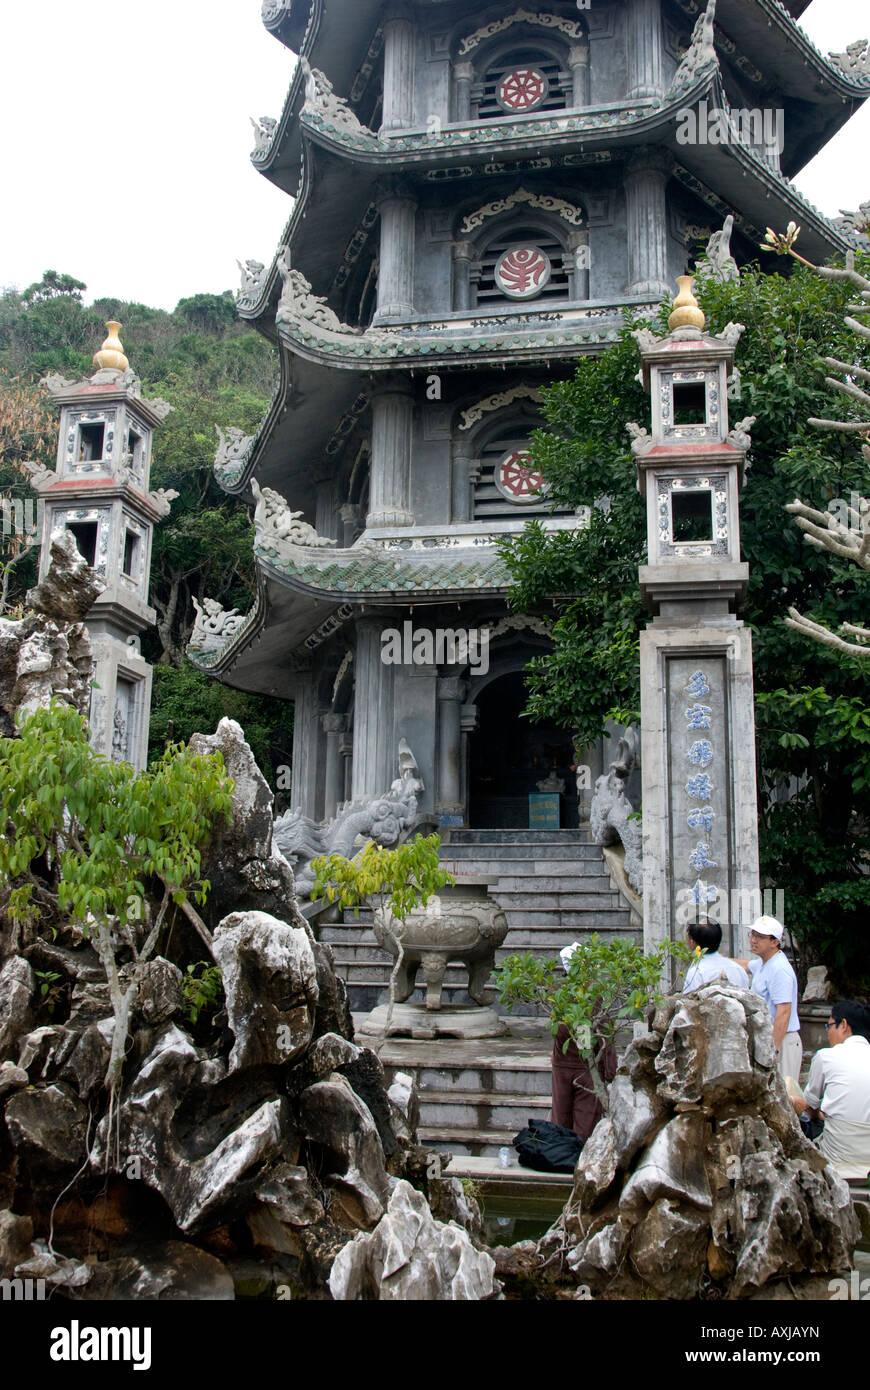 Linh Ong Pagoda, Thuy Son, Marble Mountains, Danang, Vietnam - Stock Image